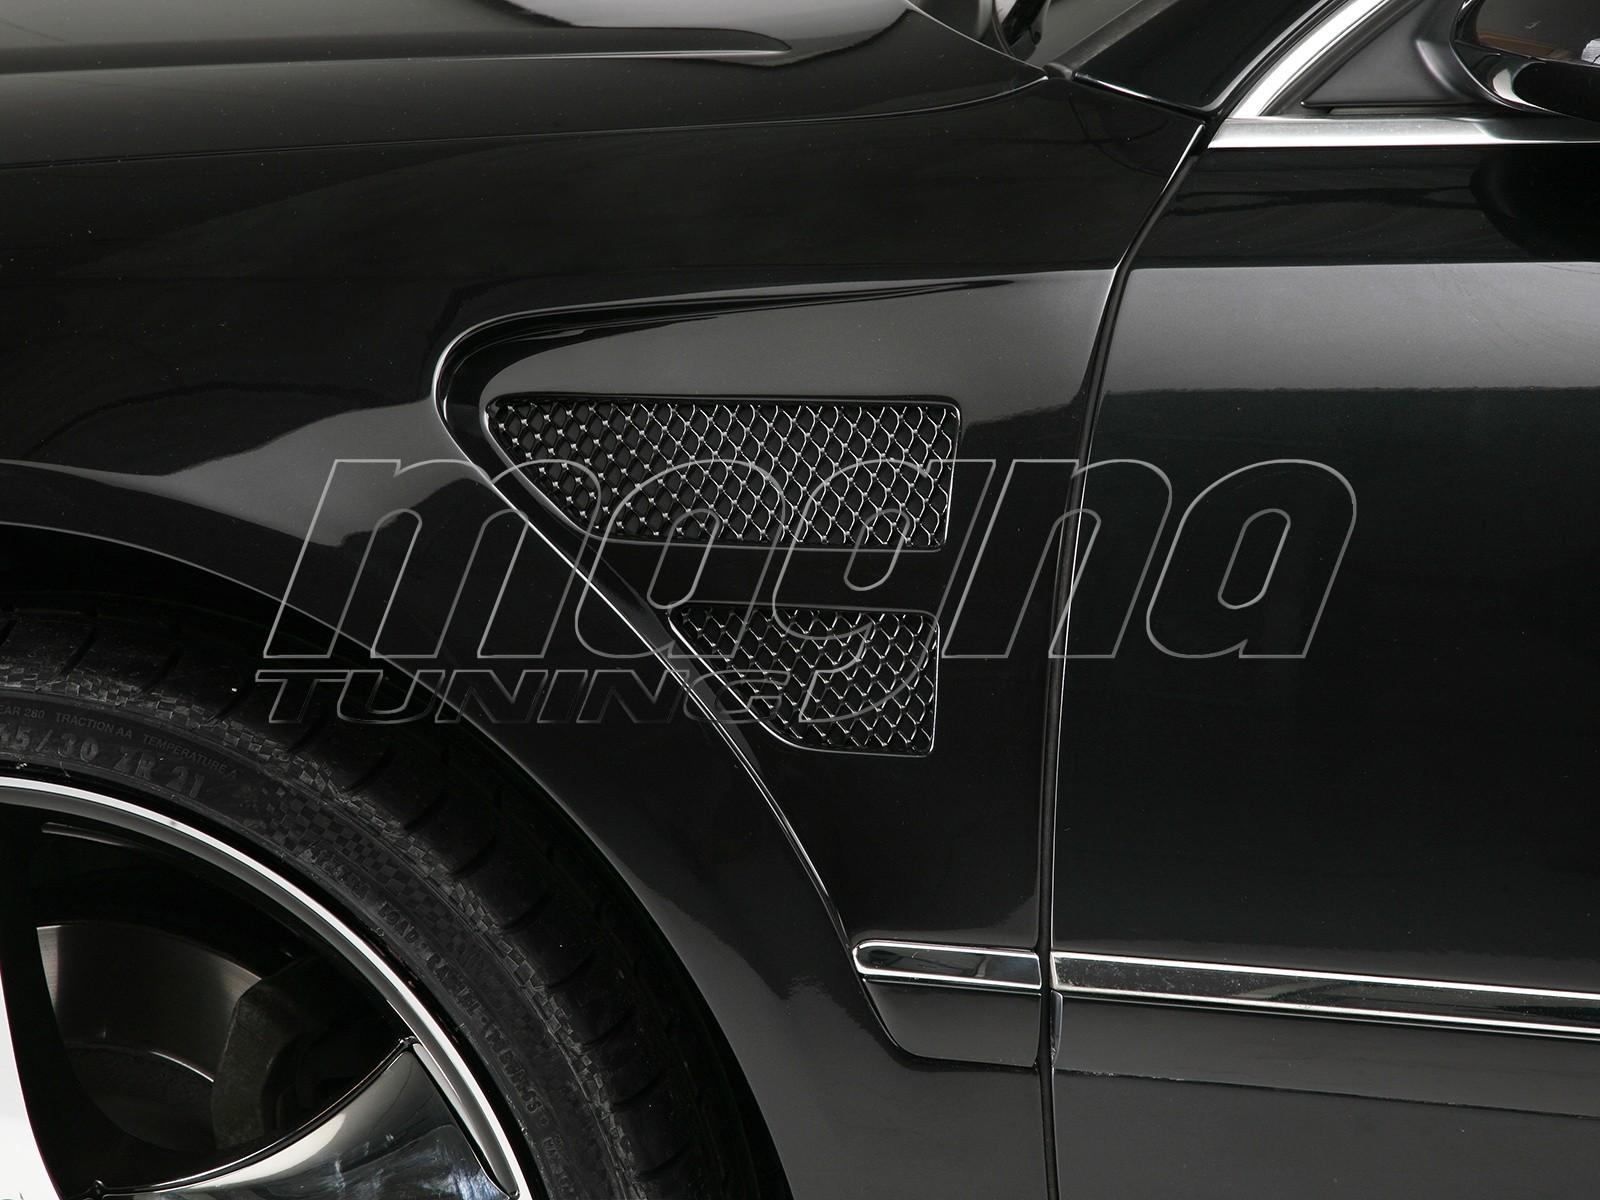 Audi A8 4E Facelift Exclusive Body Kit